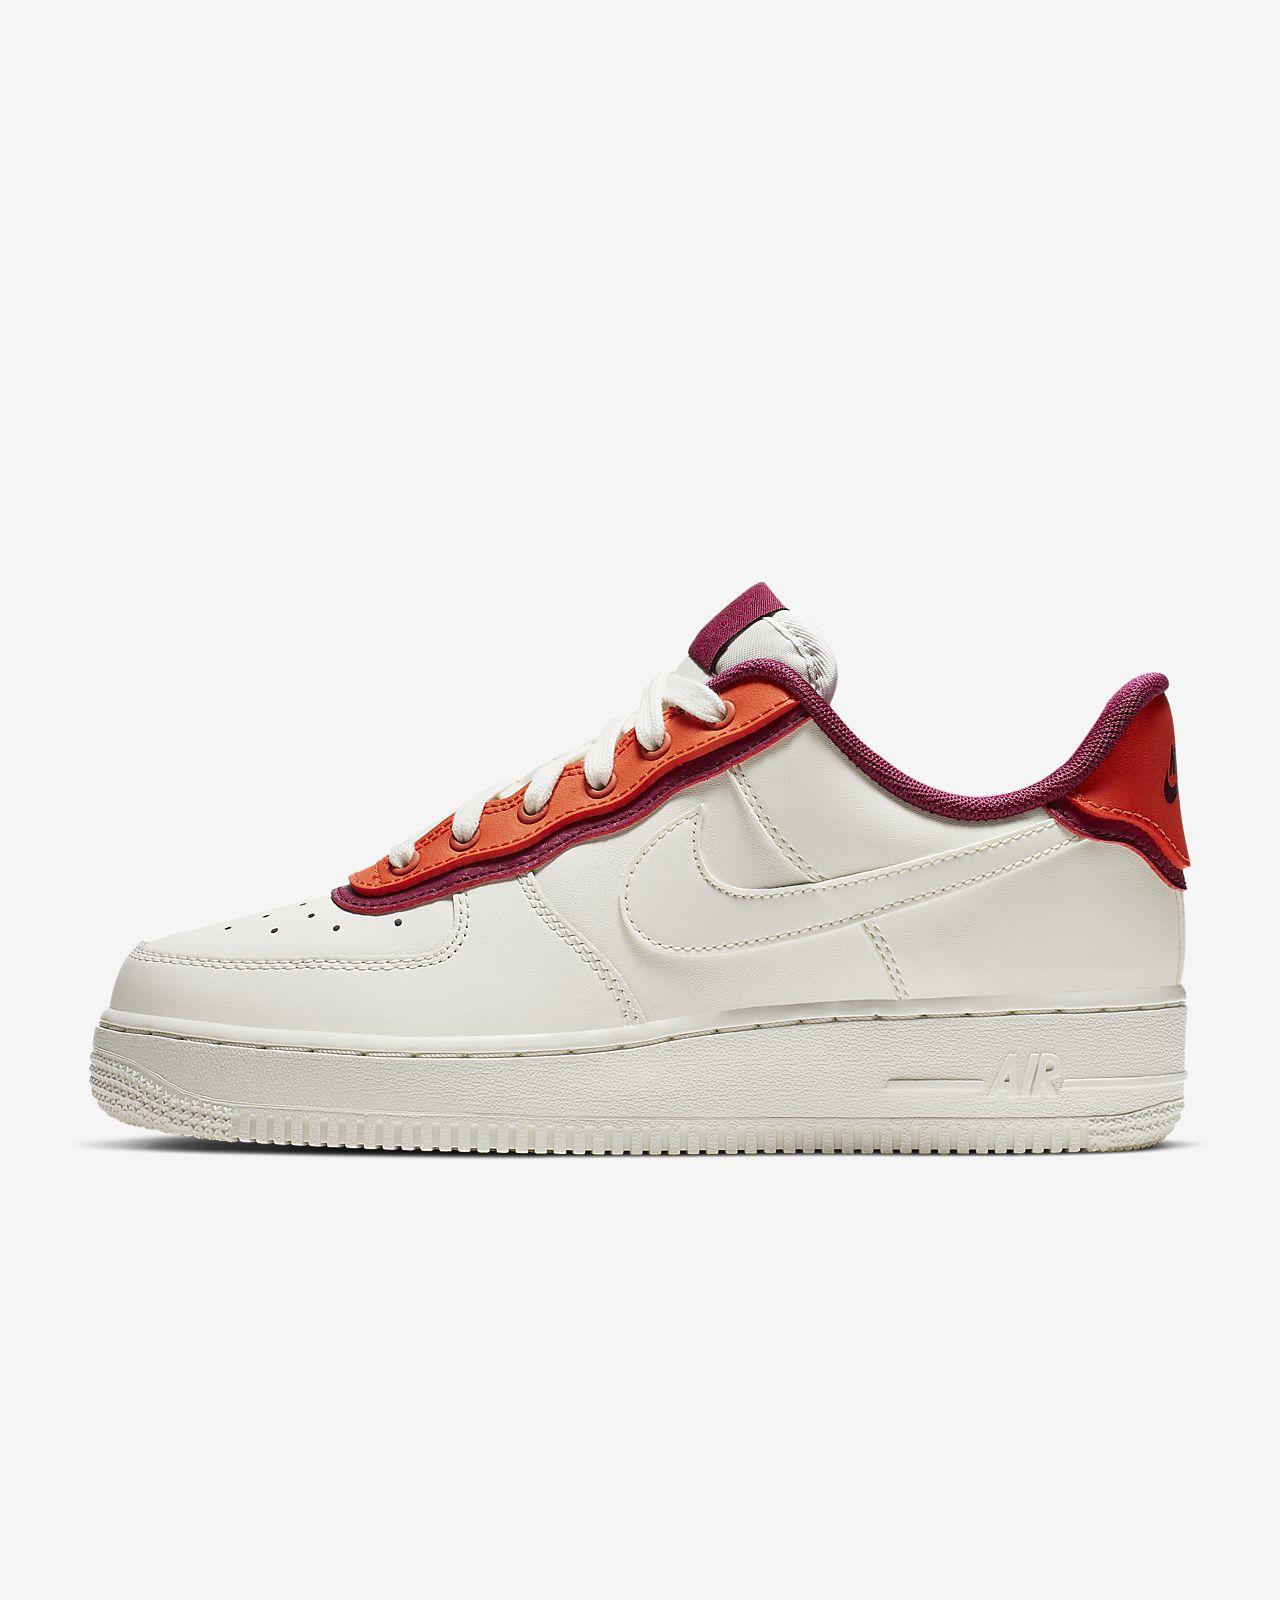 promo code 0feff 79244 ... Sko Nike Air Force 1  07 SE för kvinnor